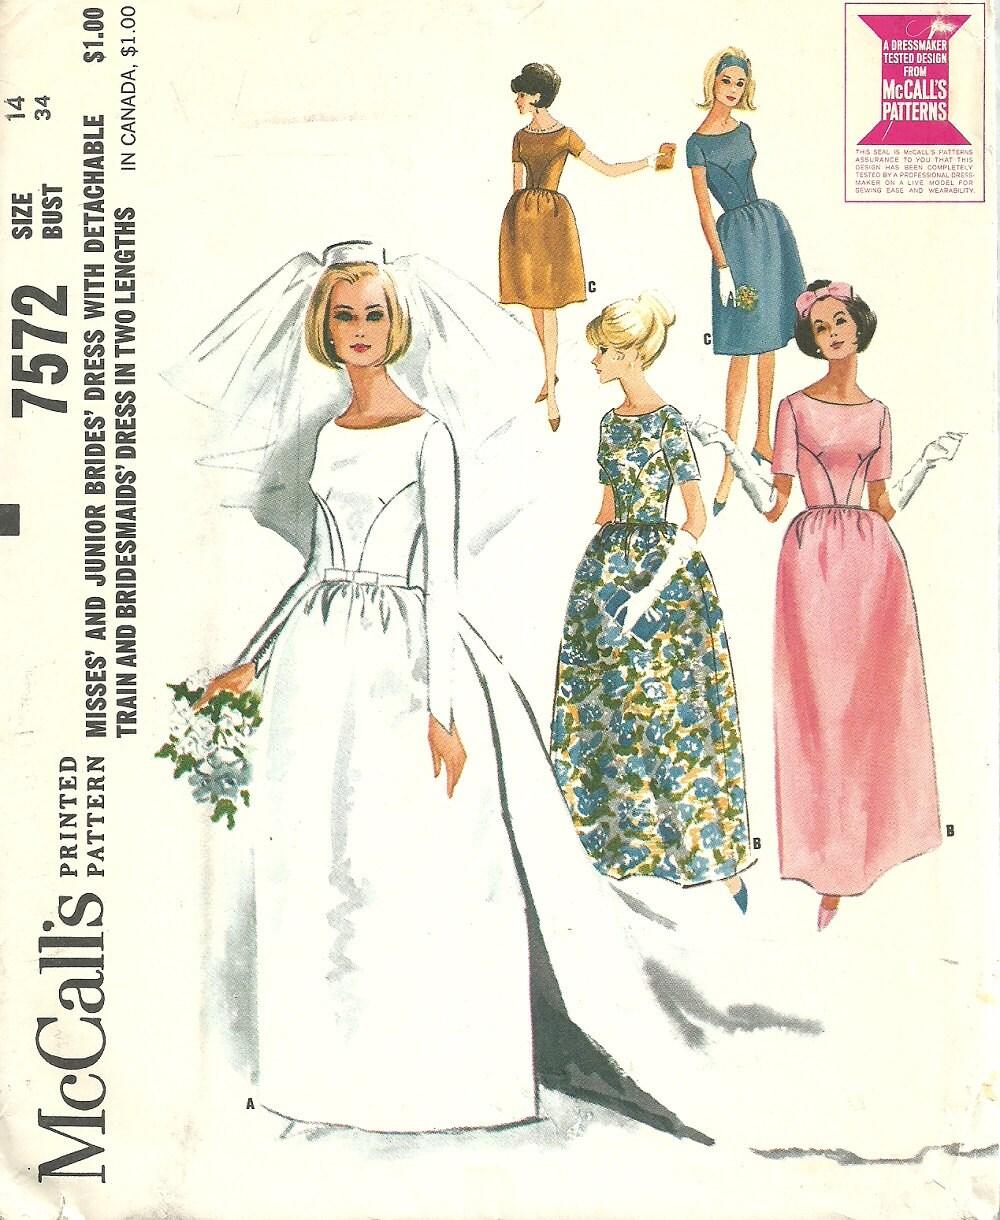 Mccalls 7572 vintage bridal sewing pattern wedding dress for Sewing patterns wedding dress